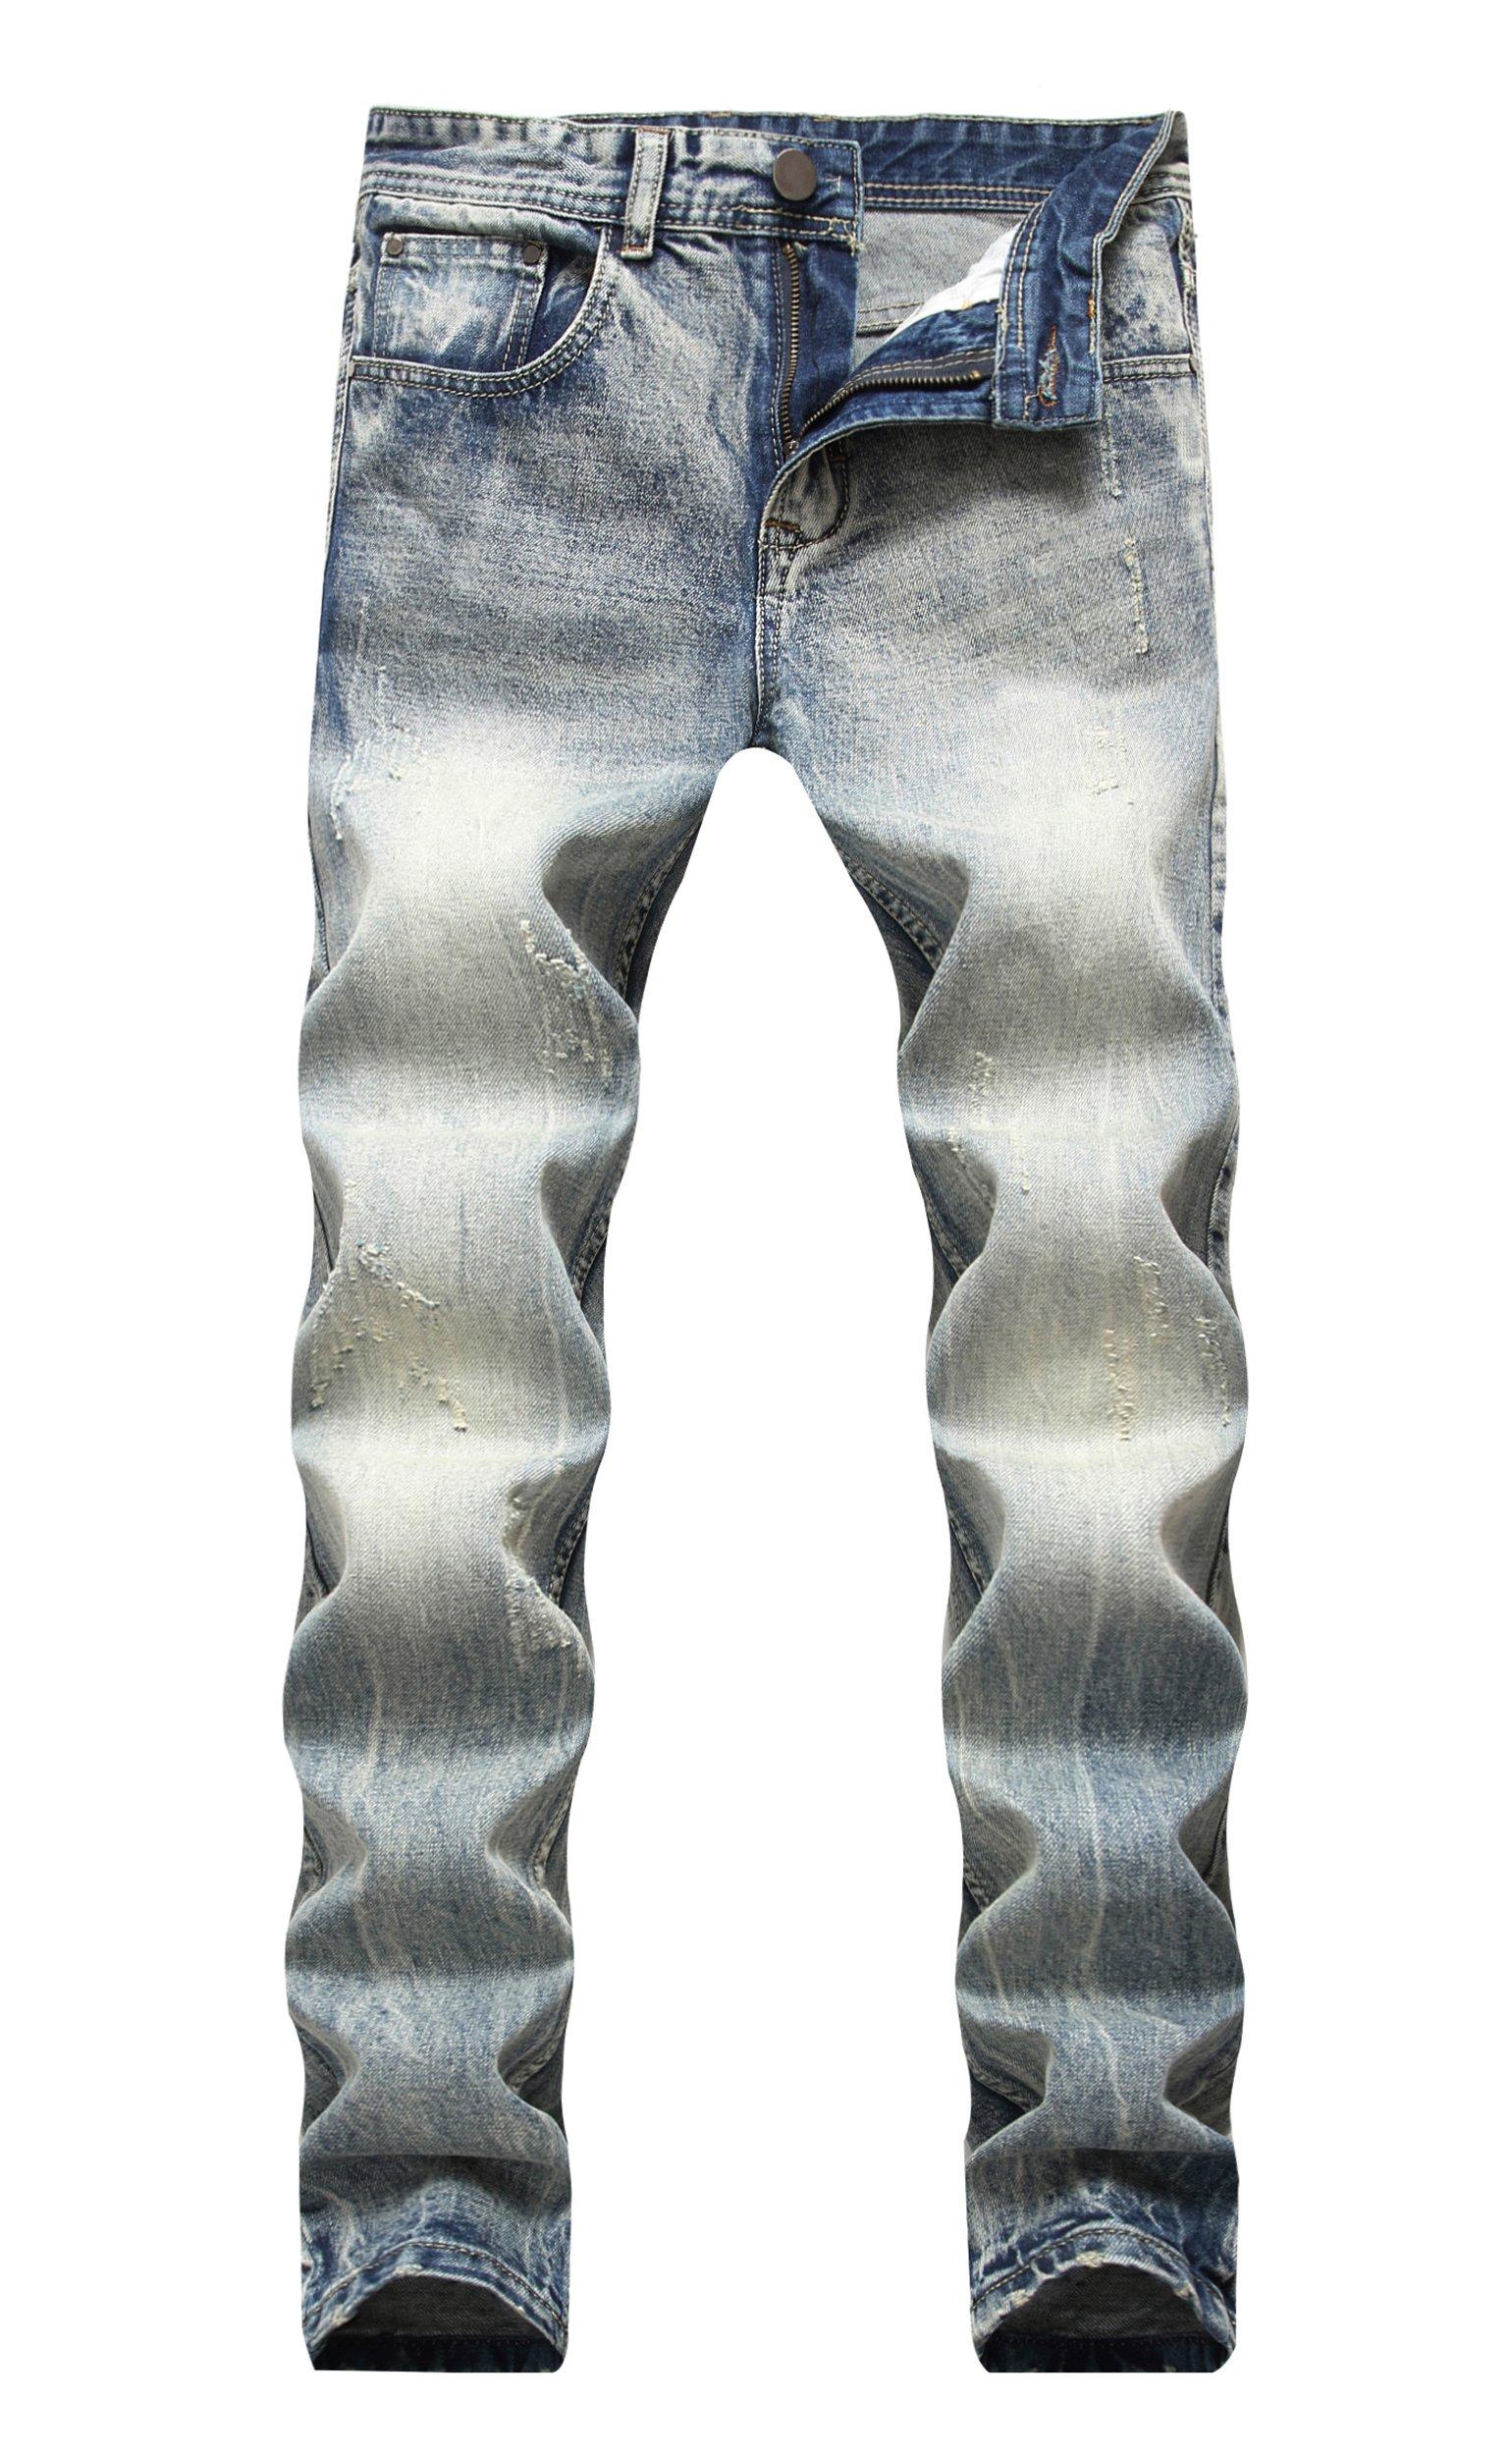 Grimgrow Men's Classic Regular-Fit Jean Comfort Destroyed Relaxed Fit Denim Pants 32